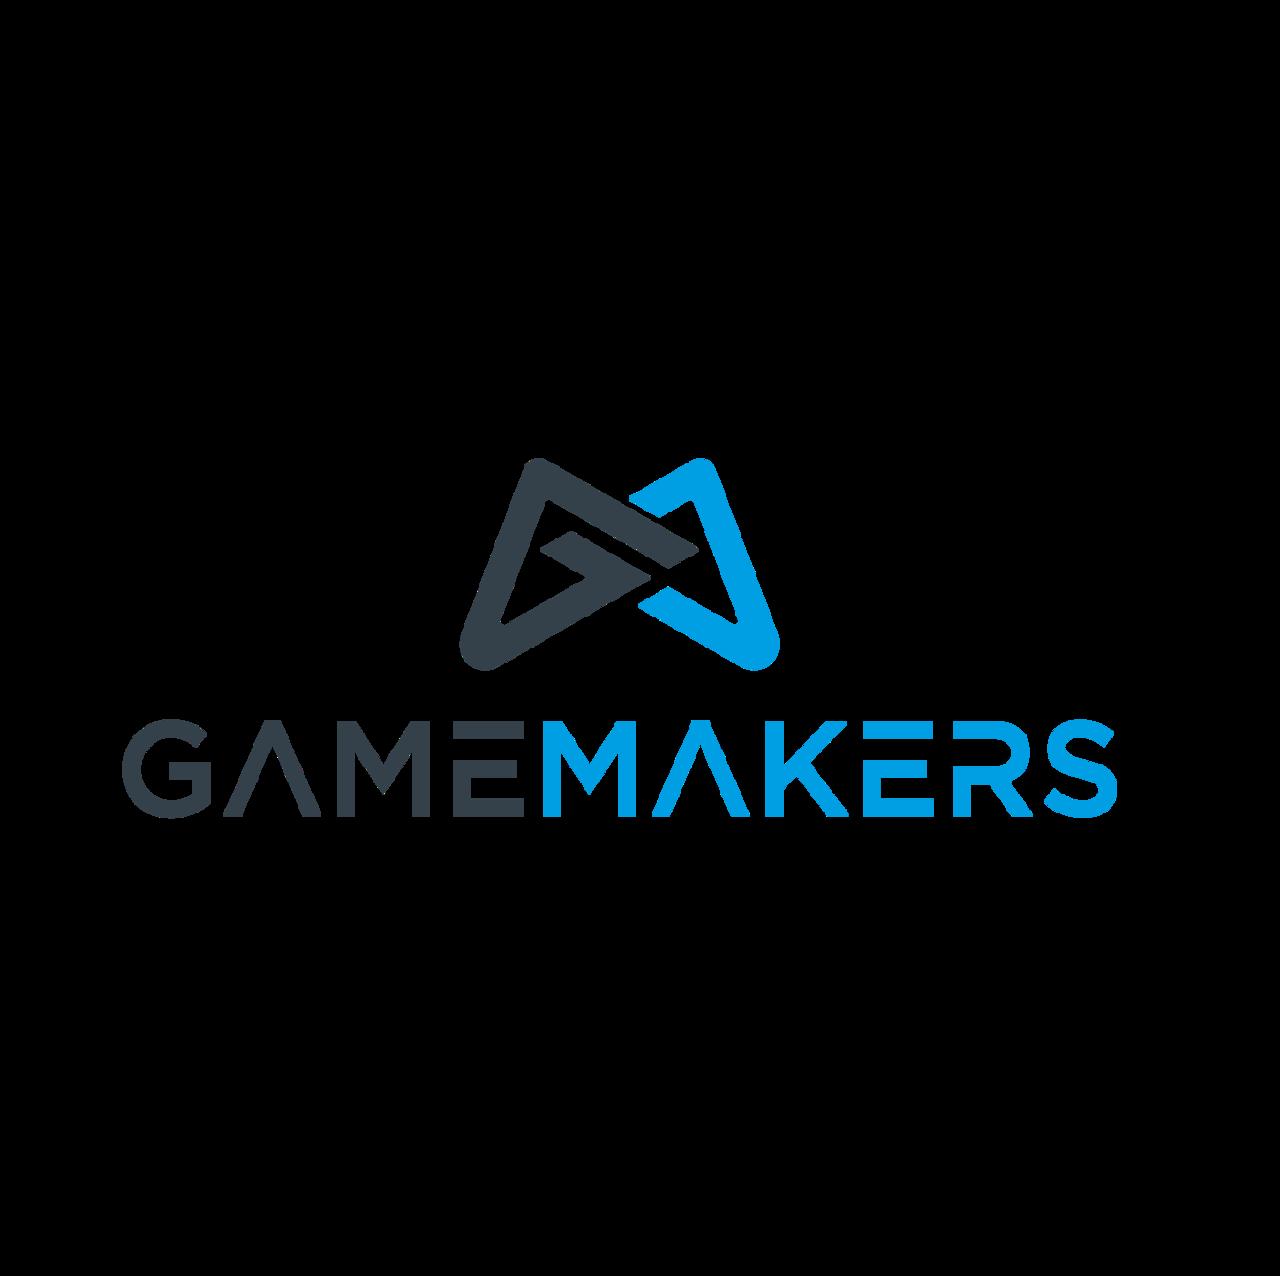 The GameMakers Letter by Joseph Kim